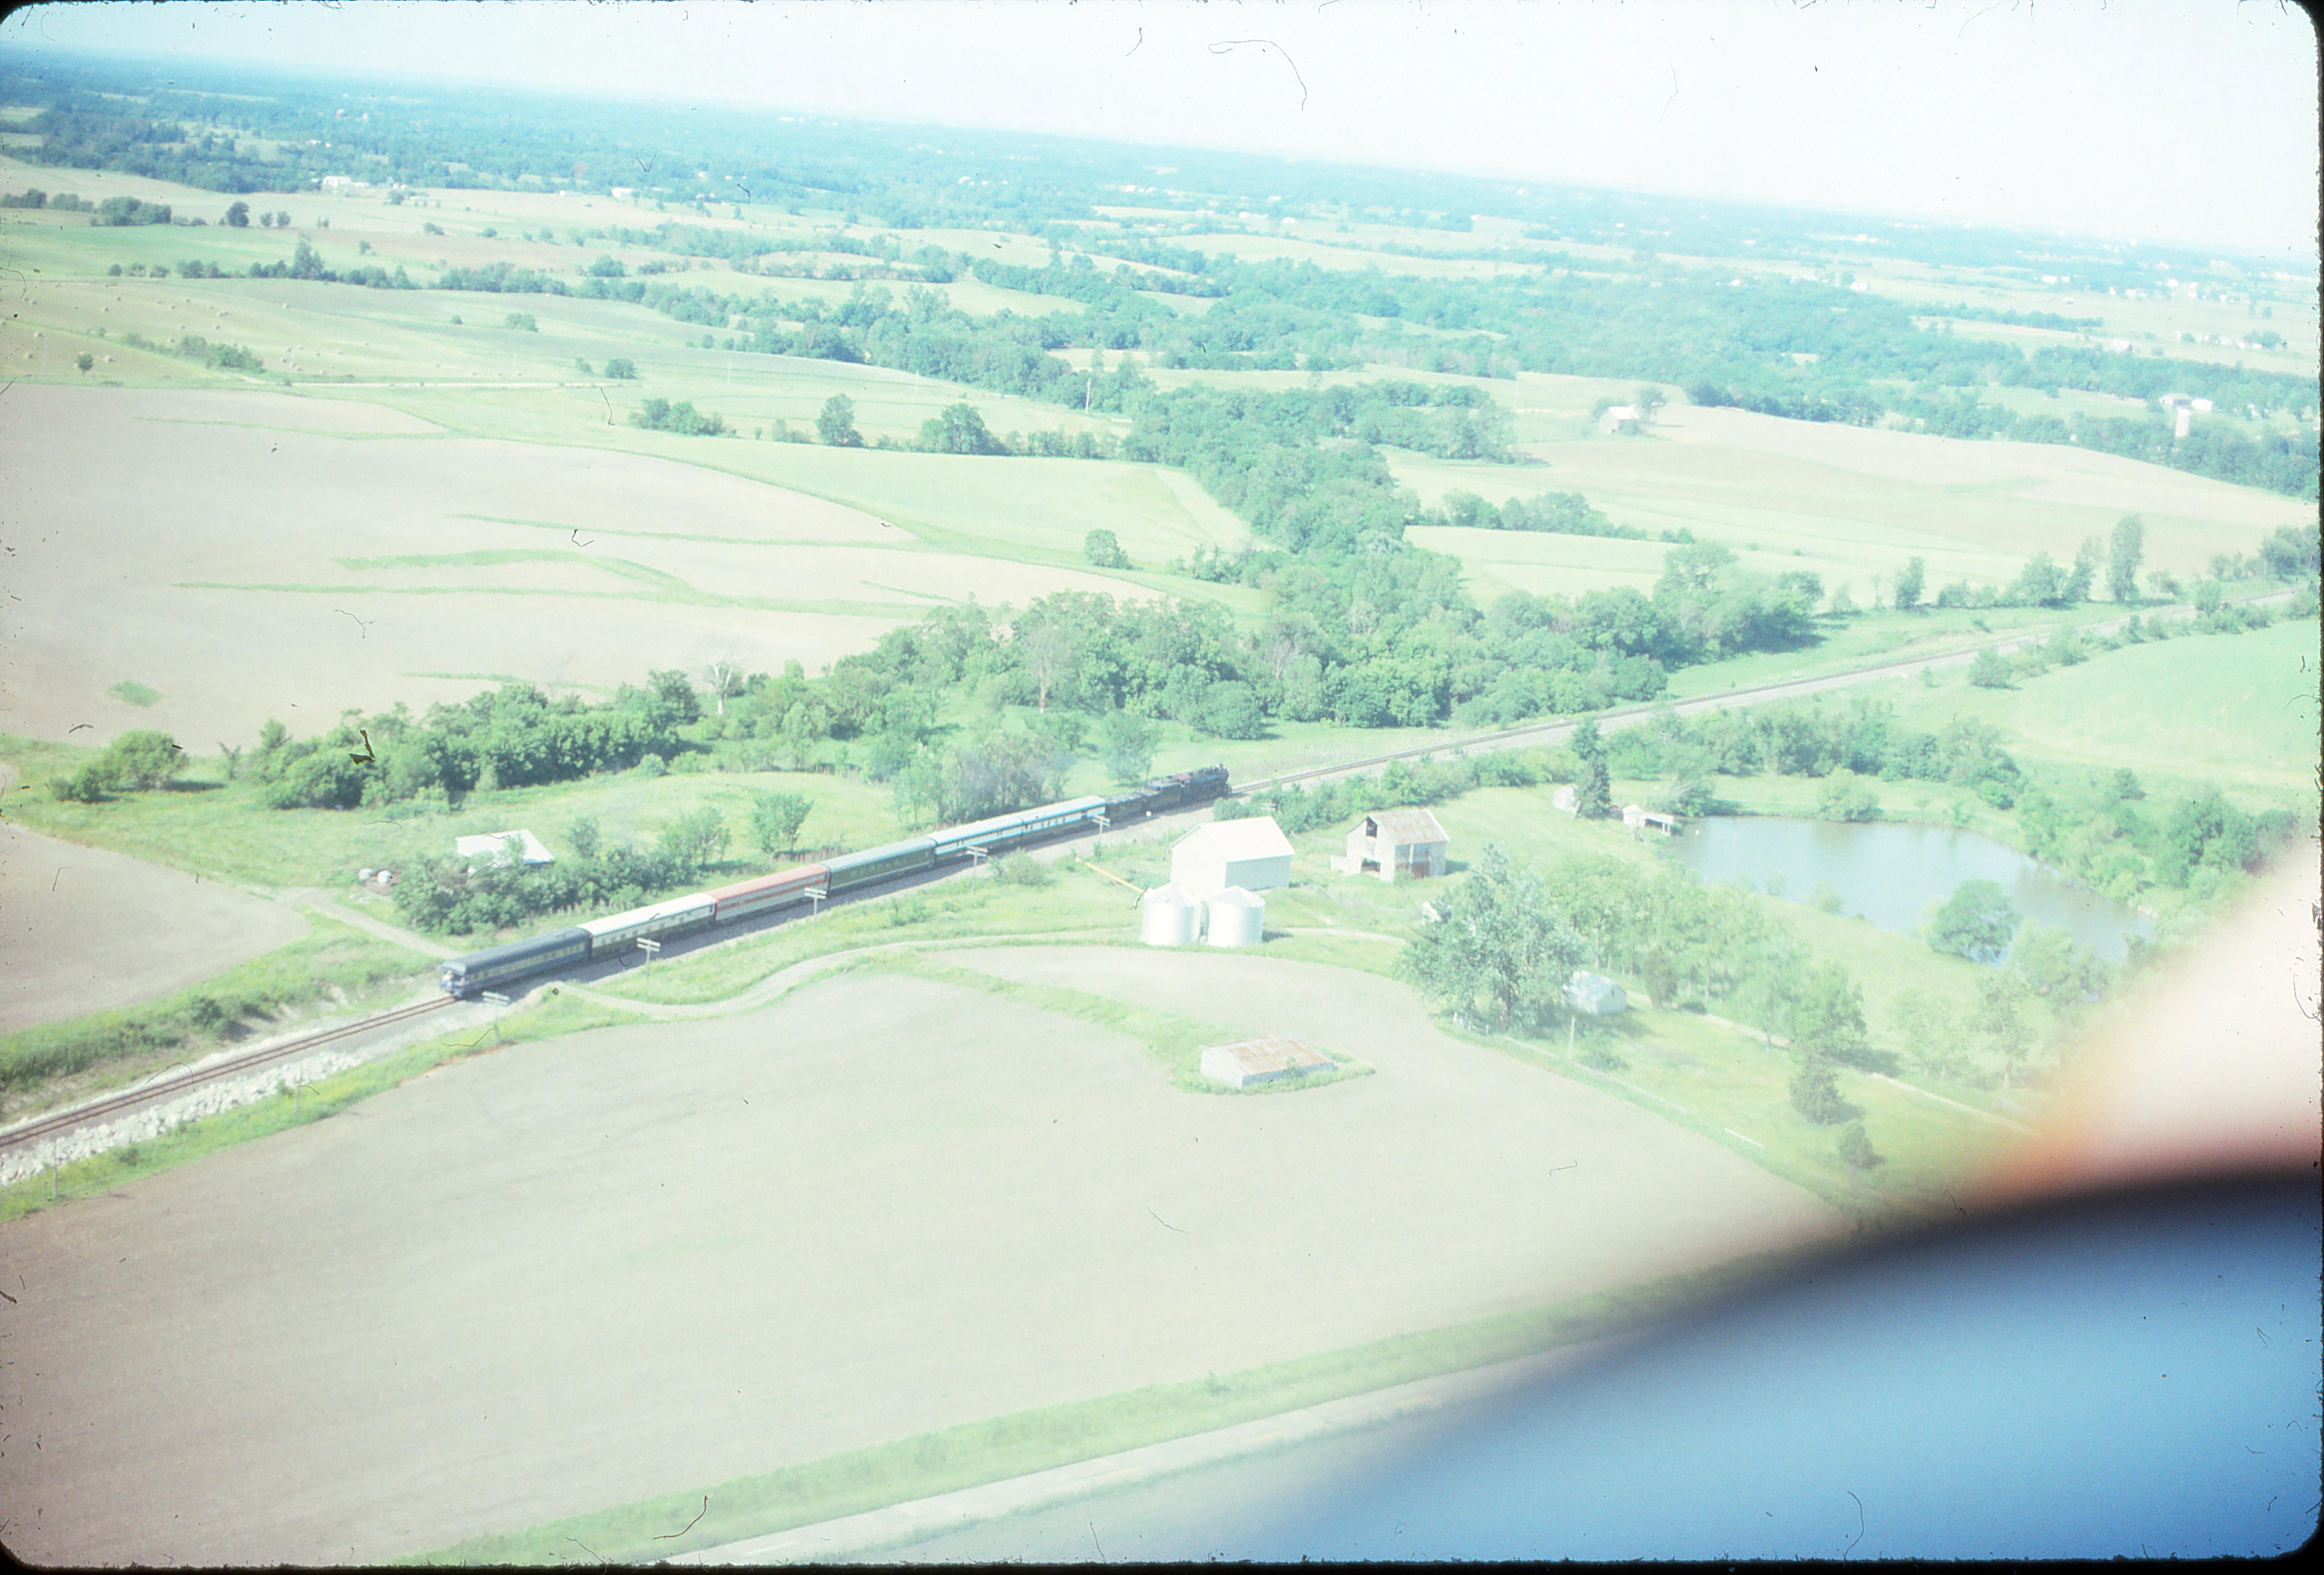 4-8-2 1522 by air in Illinois in June 1993 (Ken McElreath)